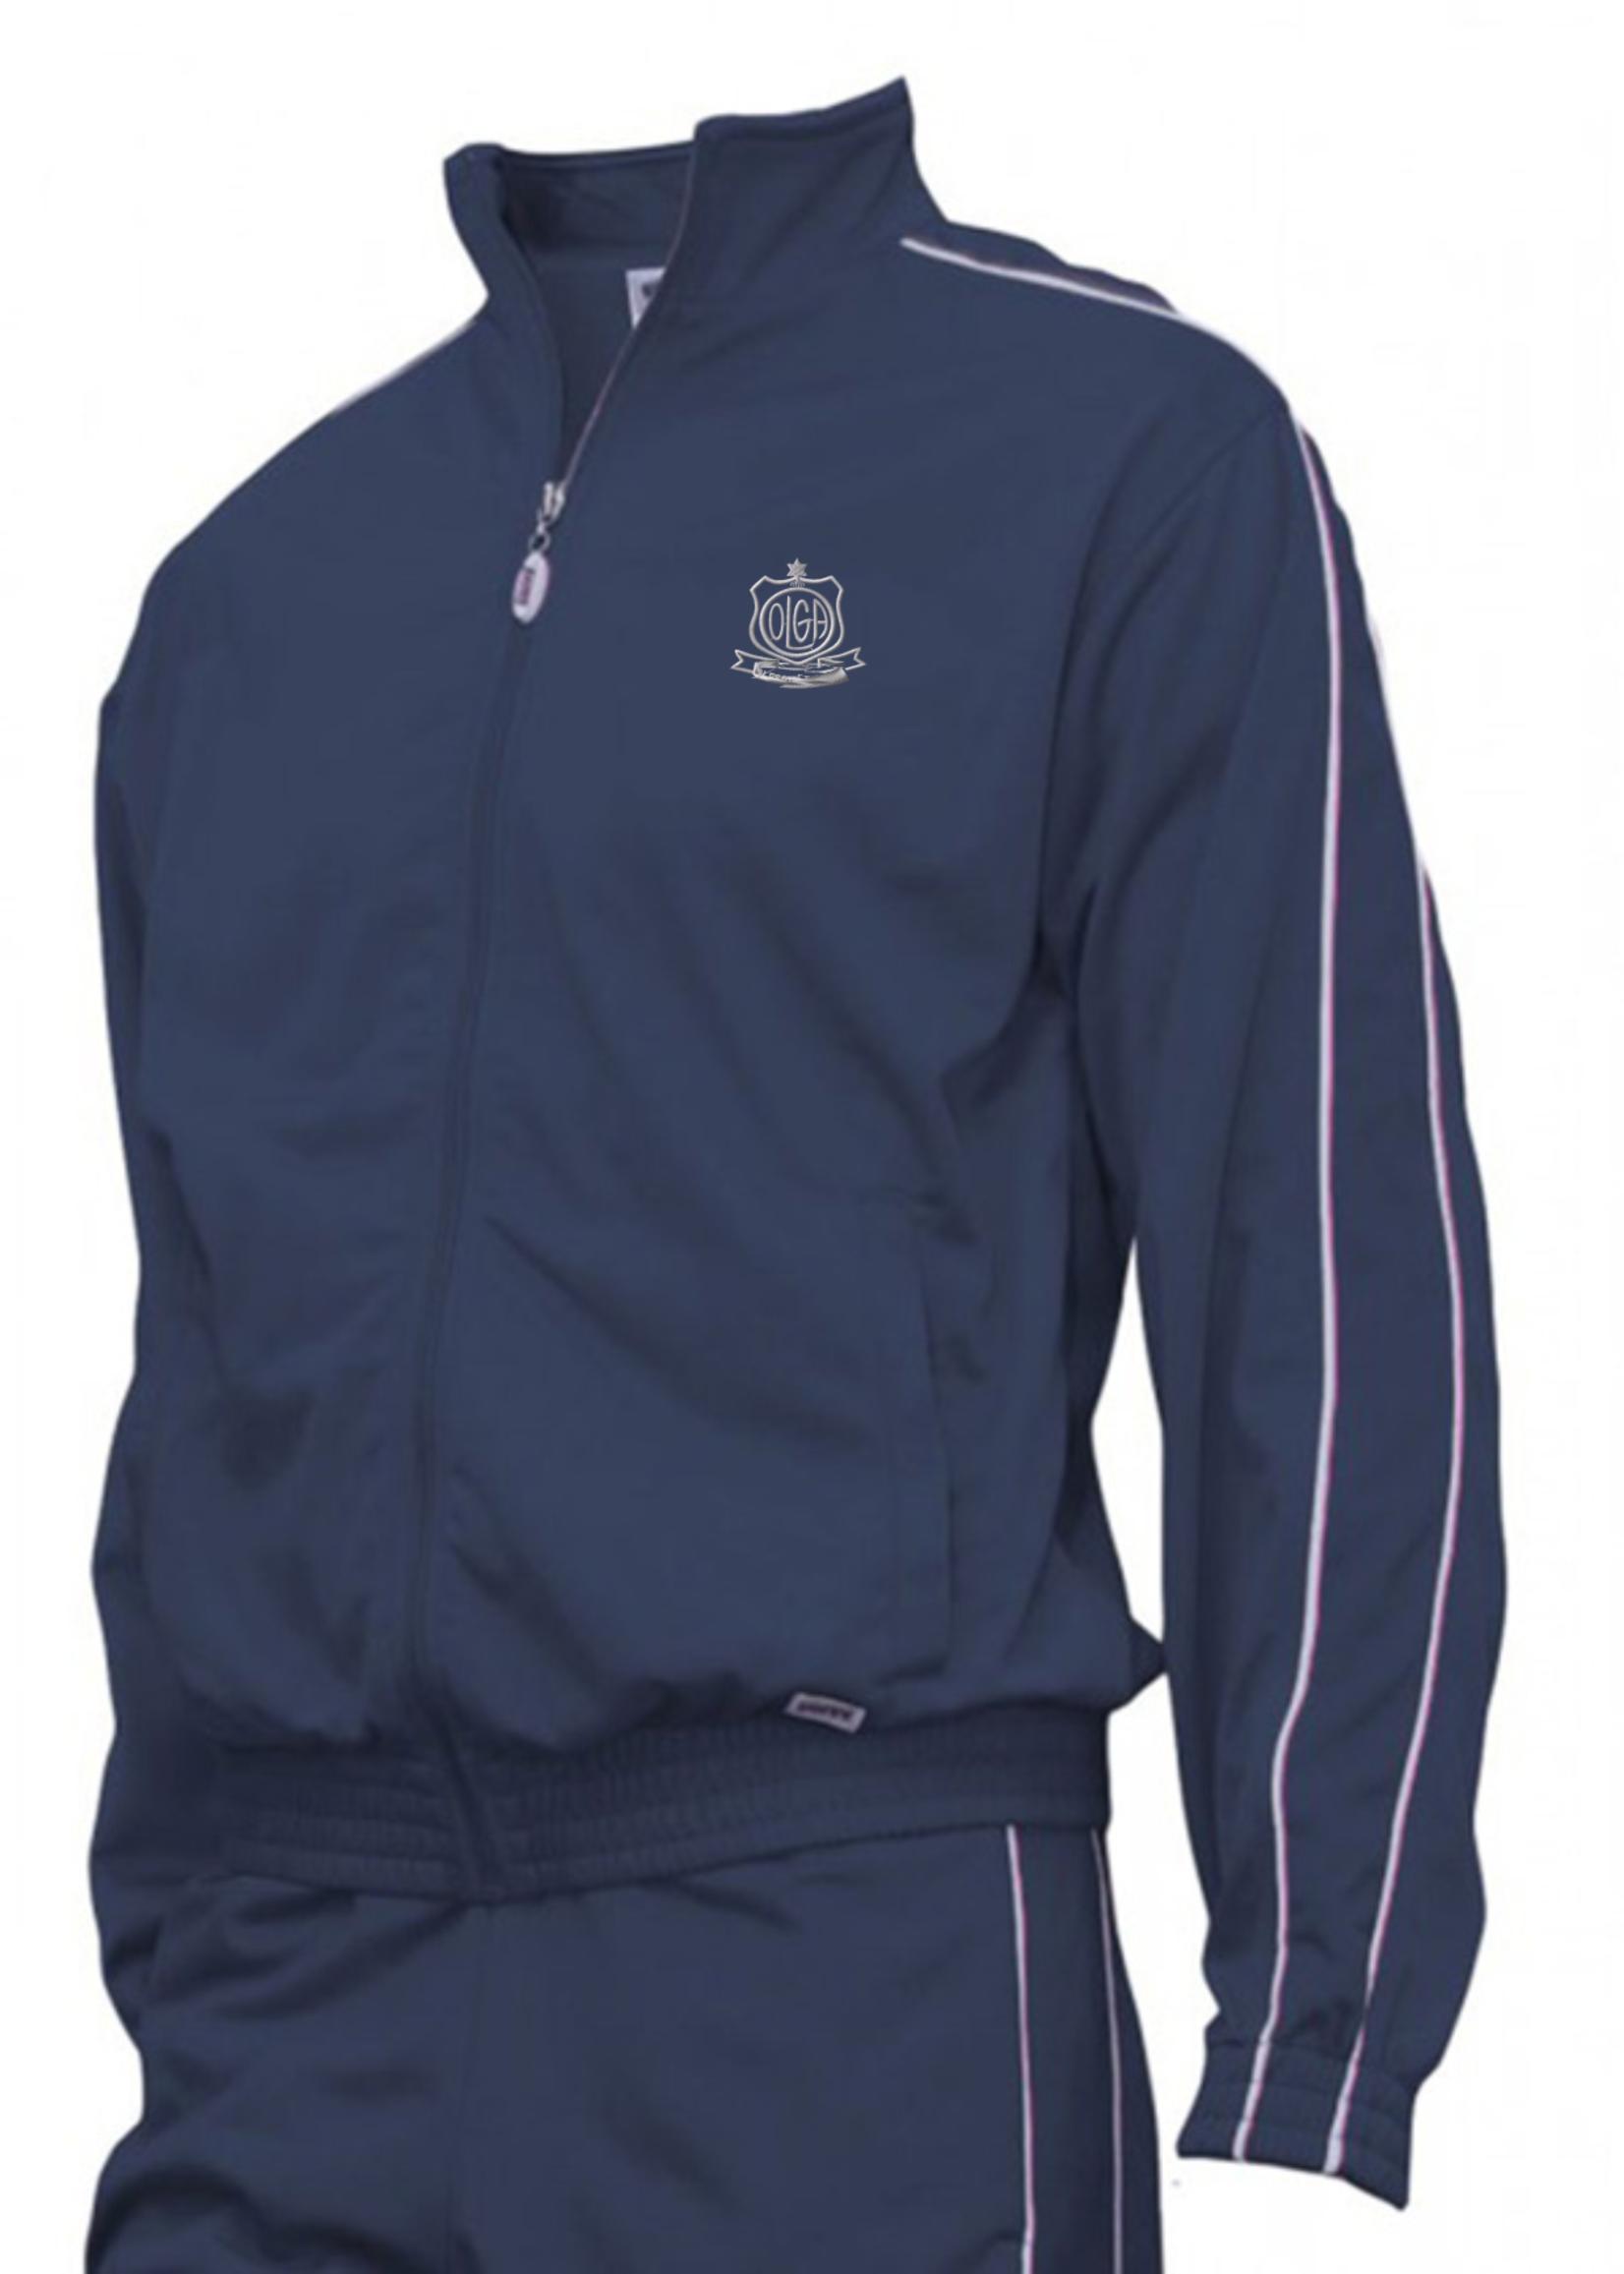 OLGA Navy Tricot Warm Up Jacket